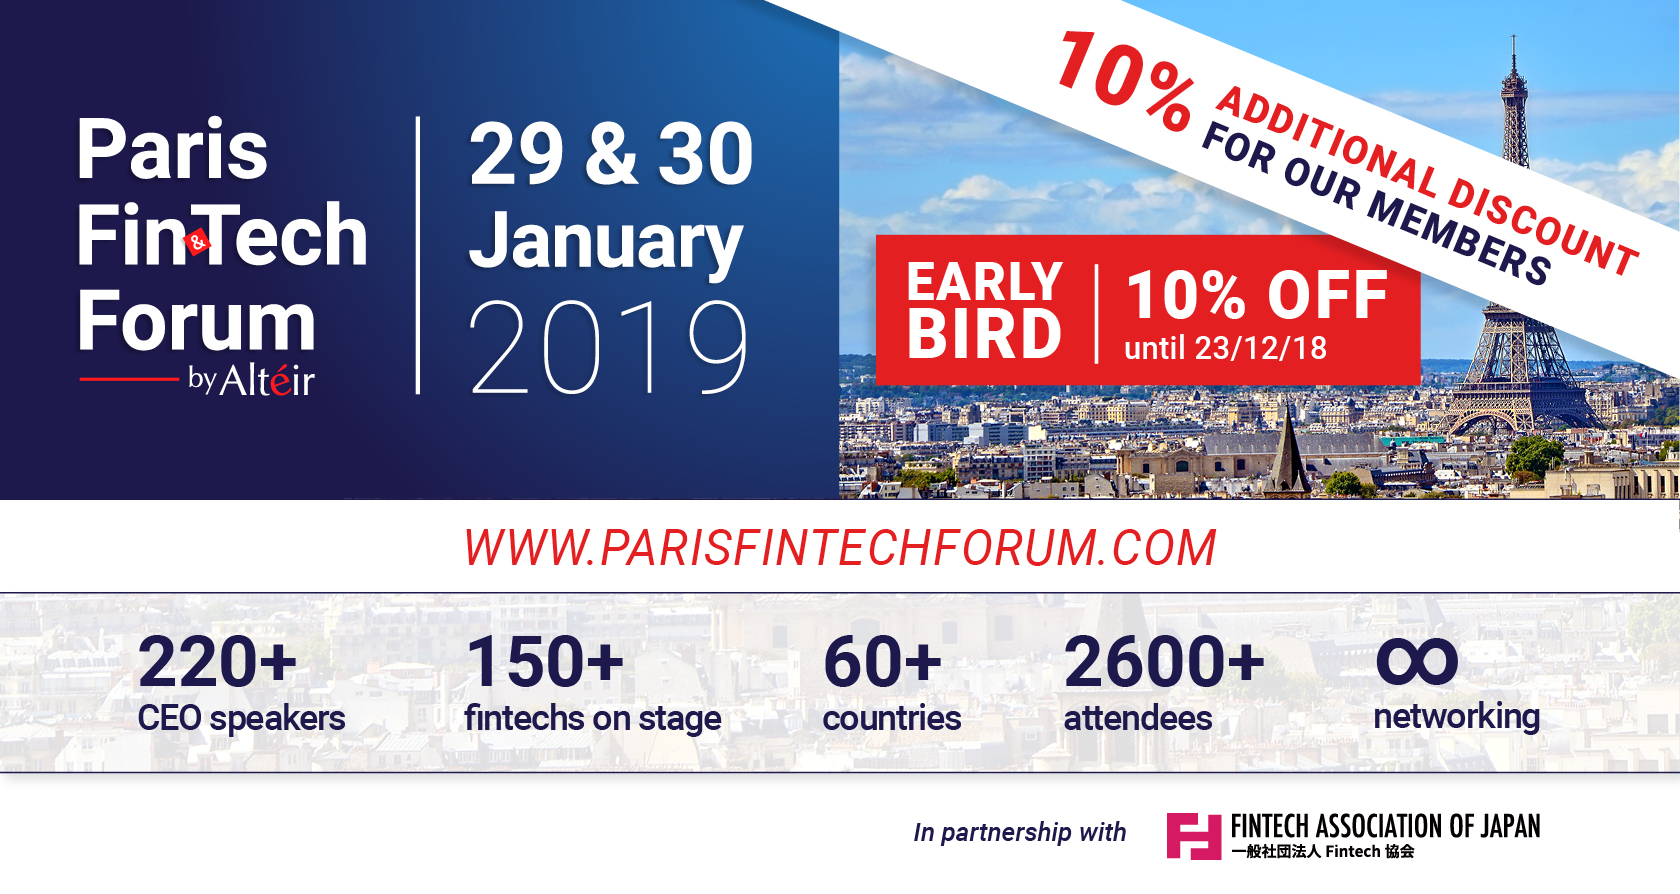 Fintech協会はParis Fintech Forum (PFF)のパートナーを務めます。Early Bird Ticket期限は12月23日まで!